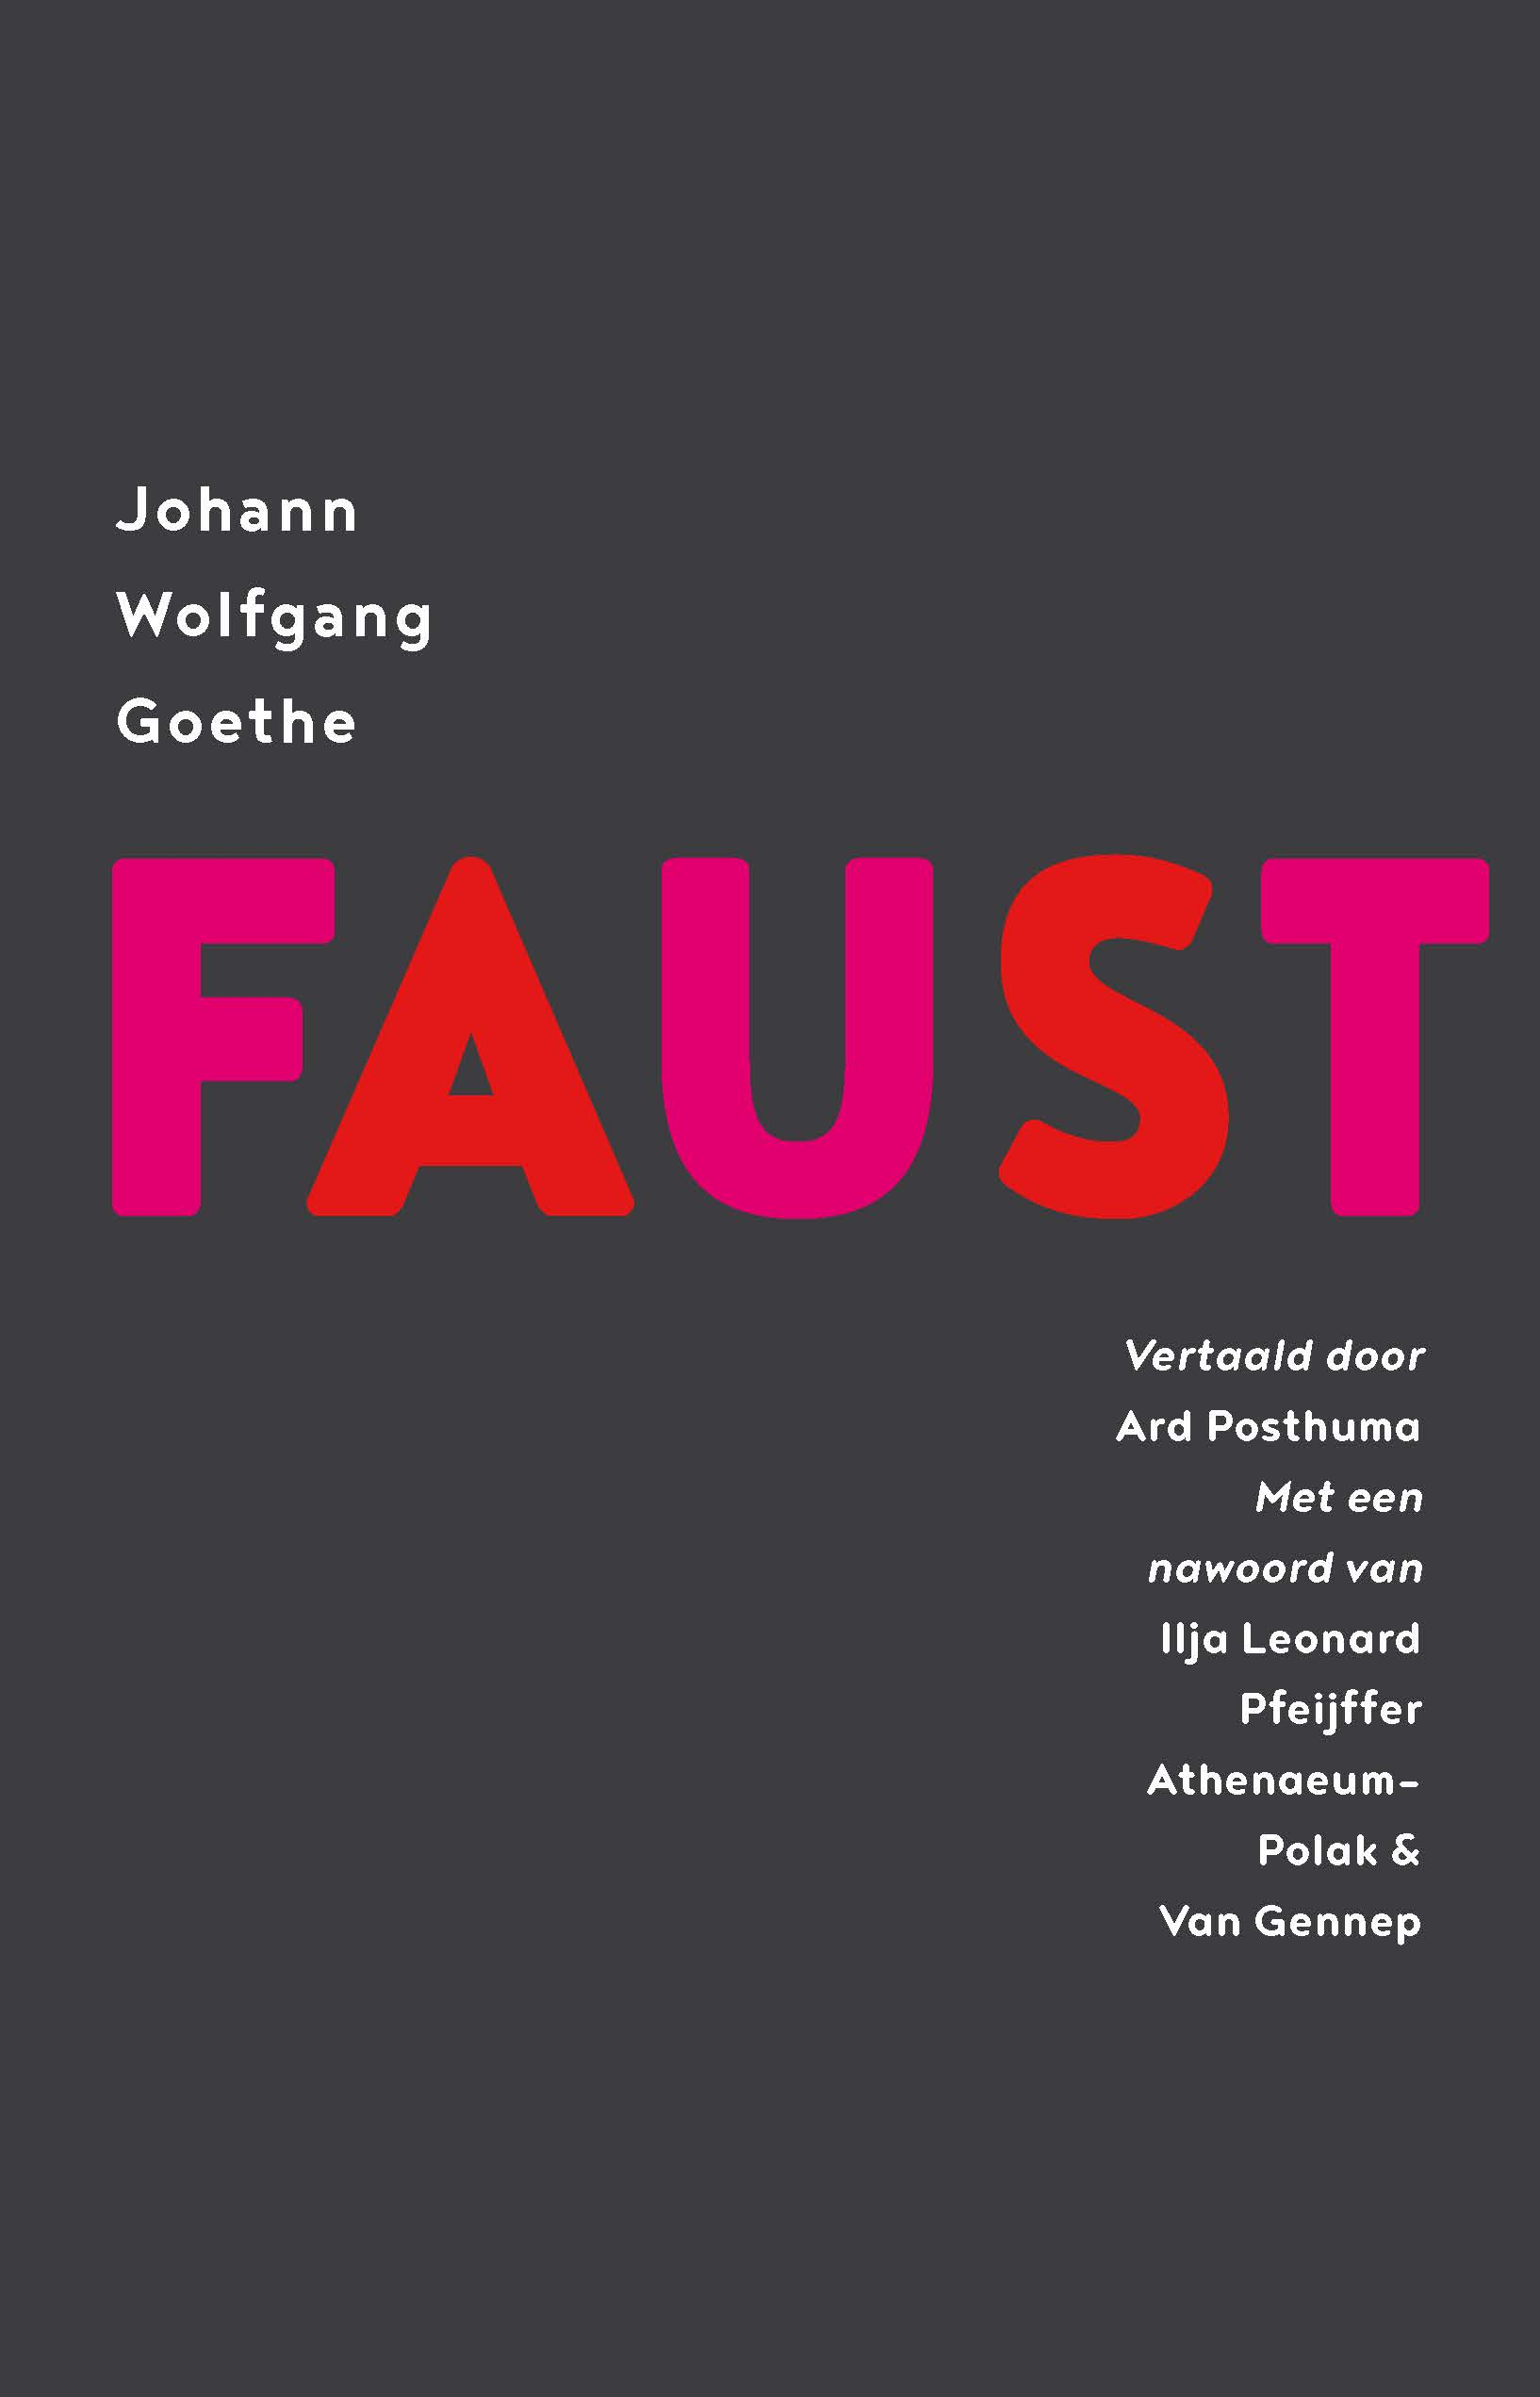 Faust – Johann Wolfgang Goethe